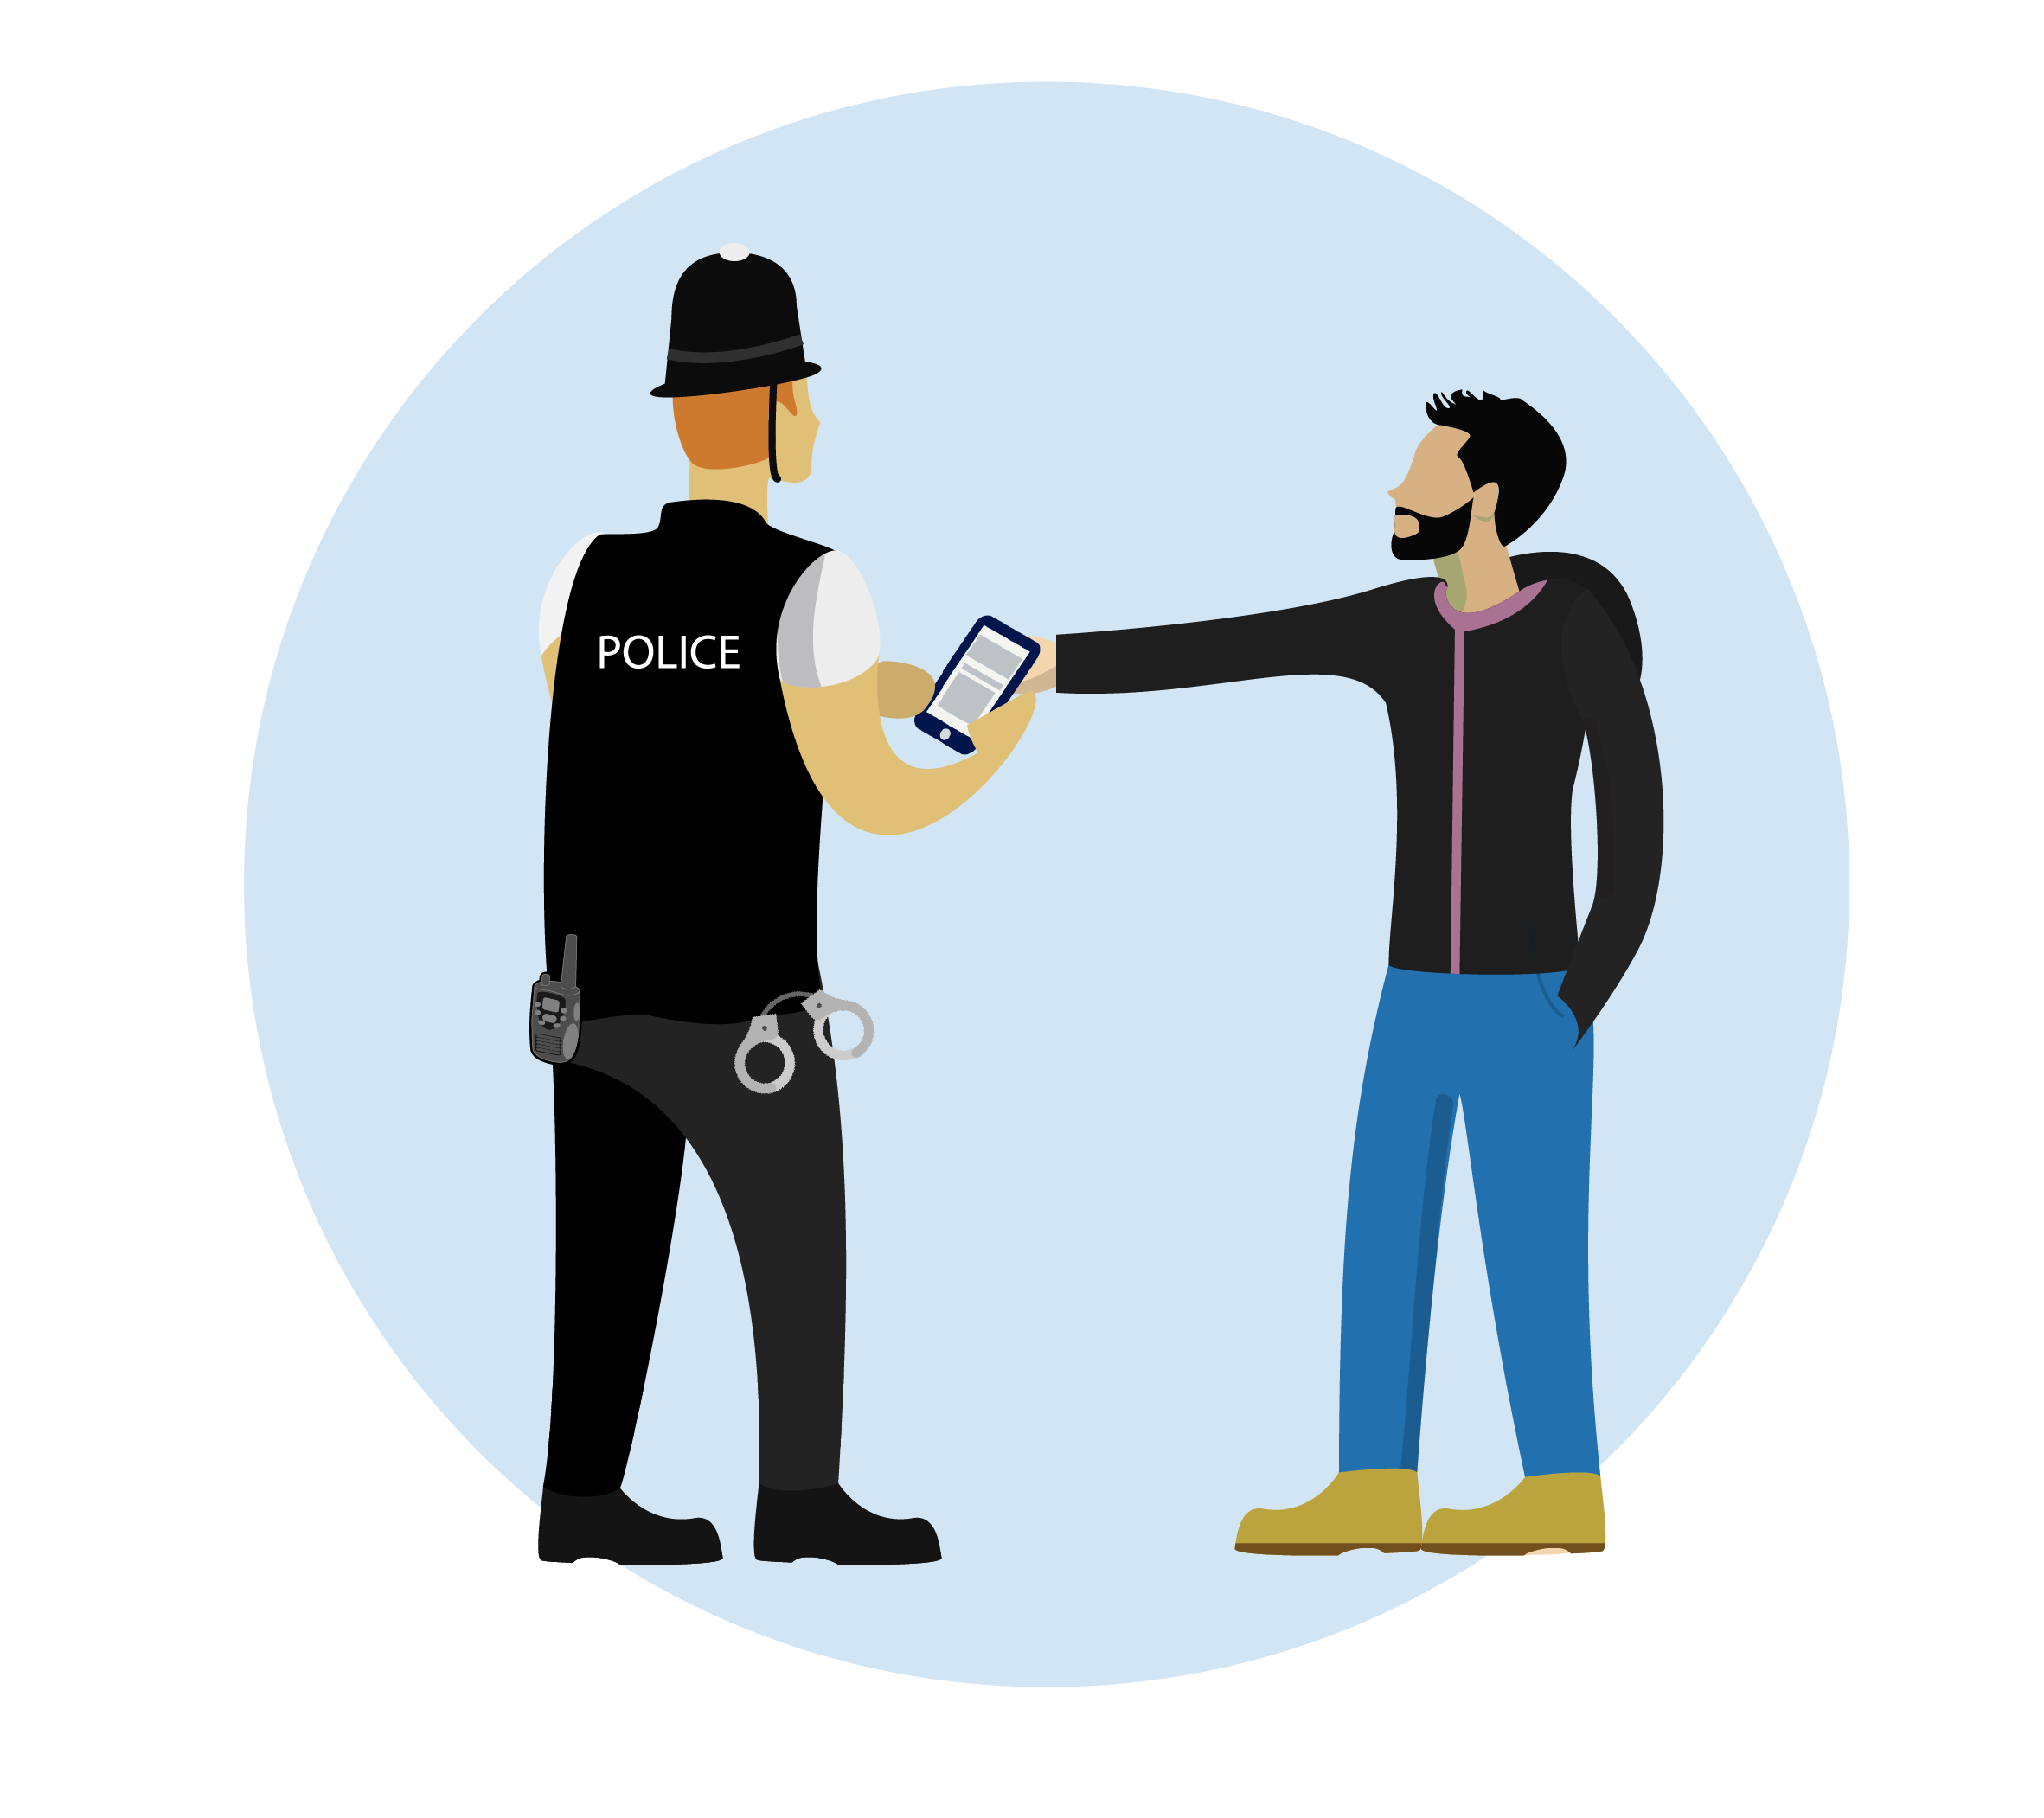 police_biometrics-02.png